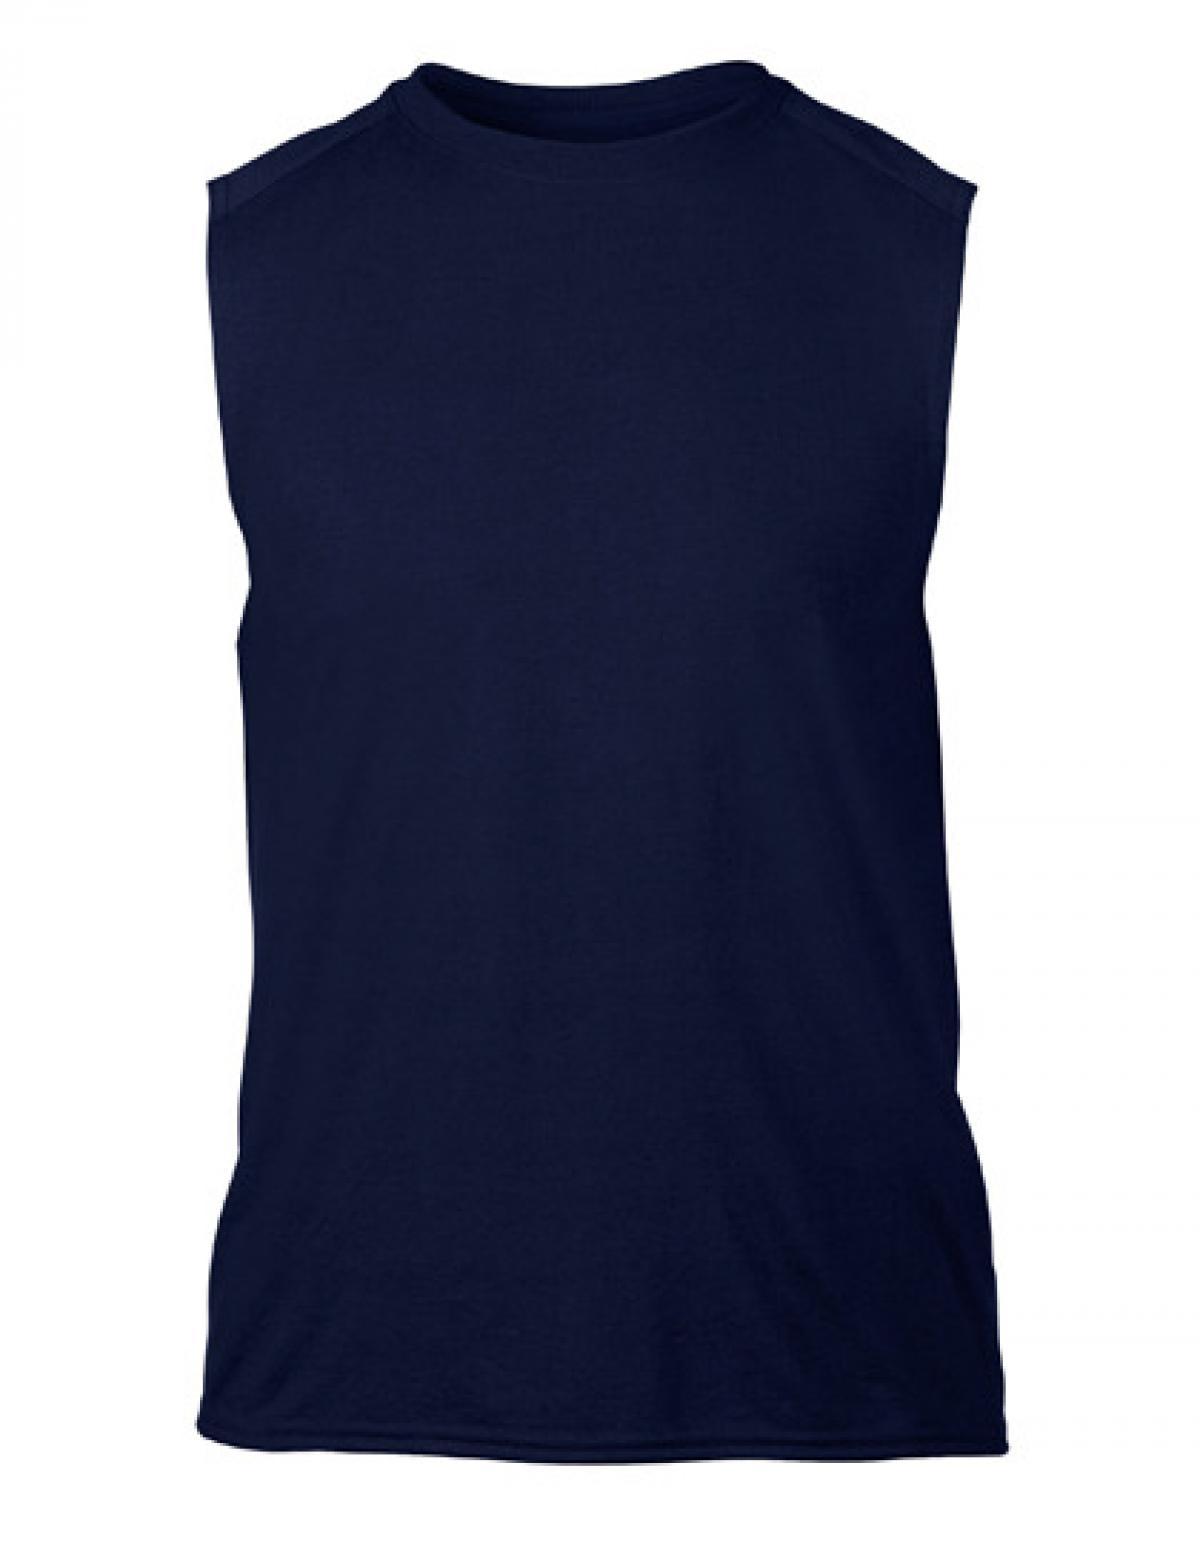 performance sleeveless tank top sport t shirt rexlander s. Black Bedroom Furniture Sets. Home Design Ideas